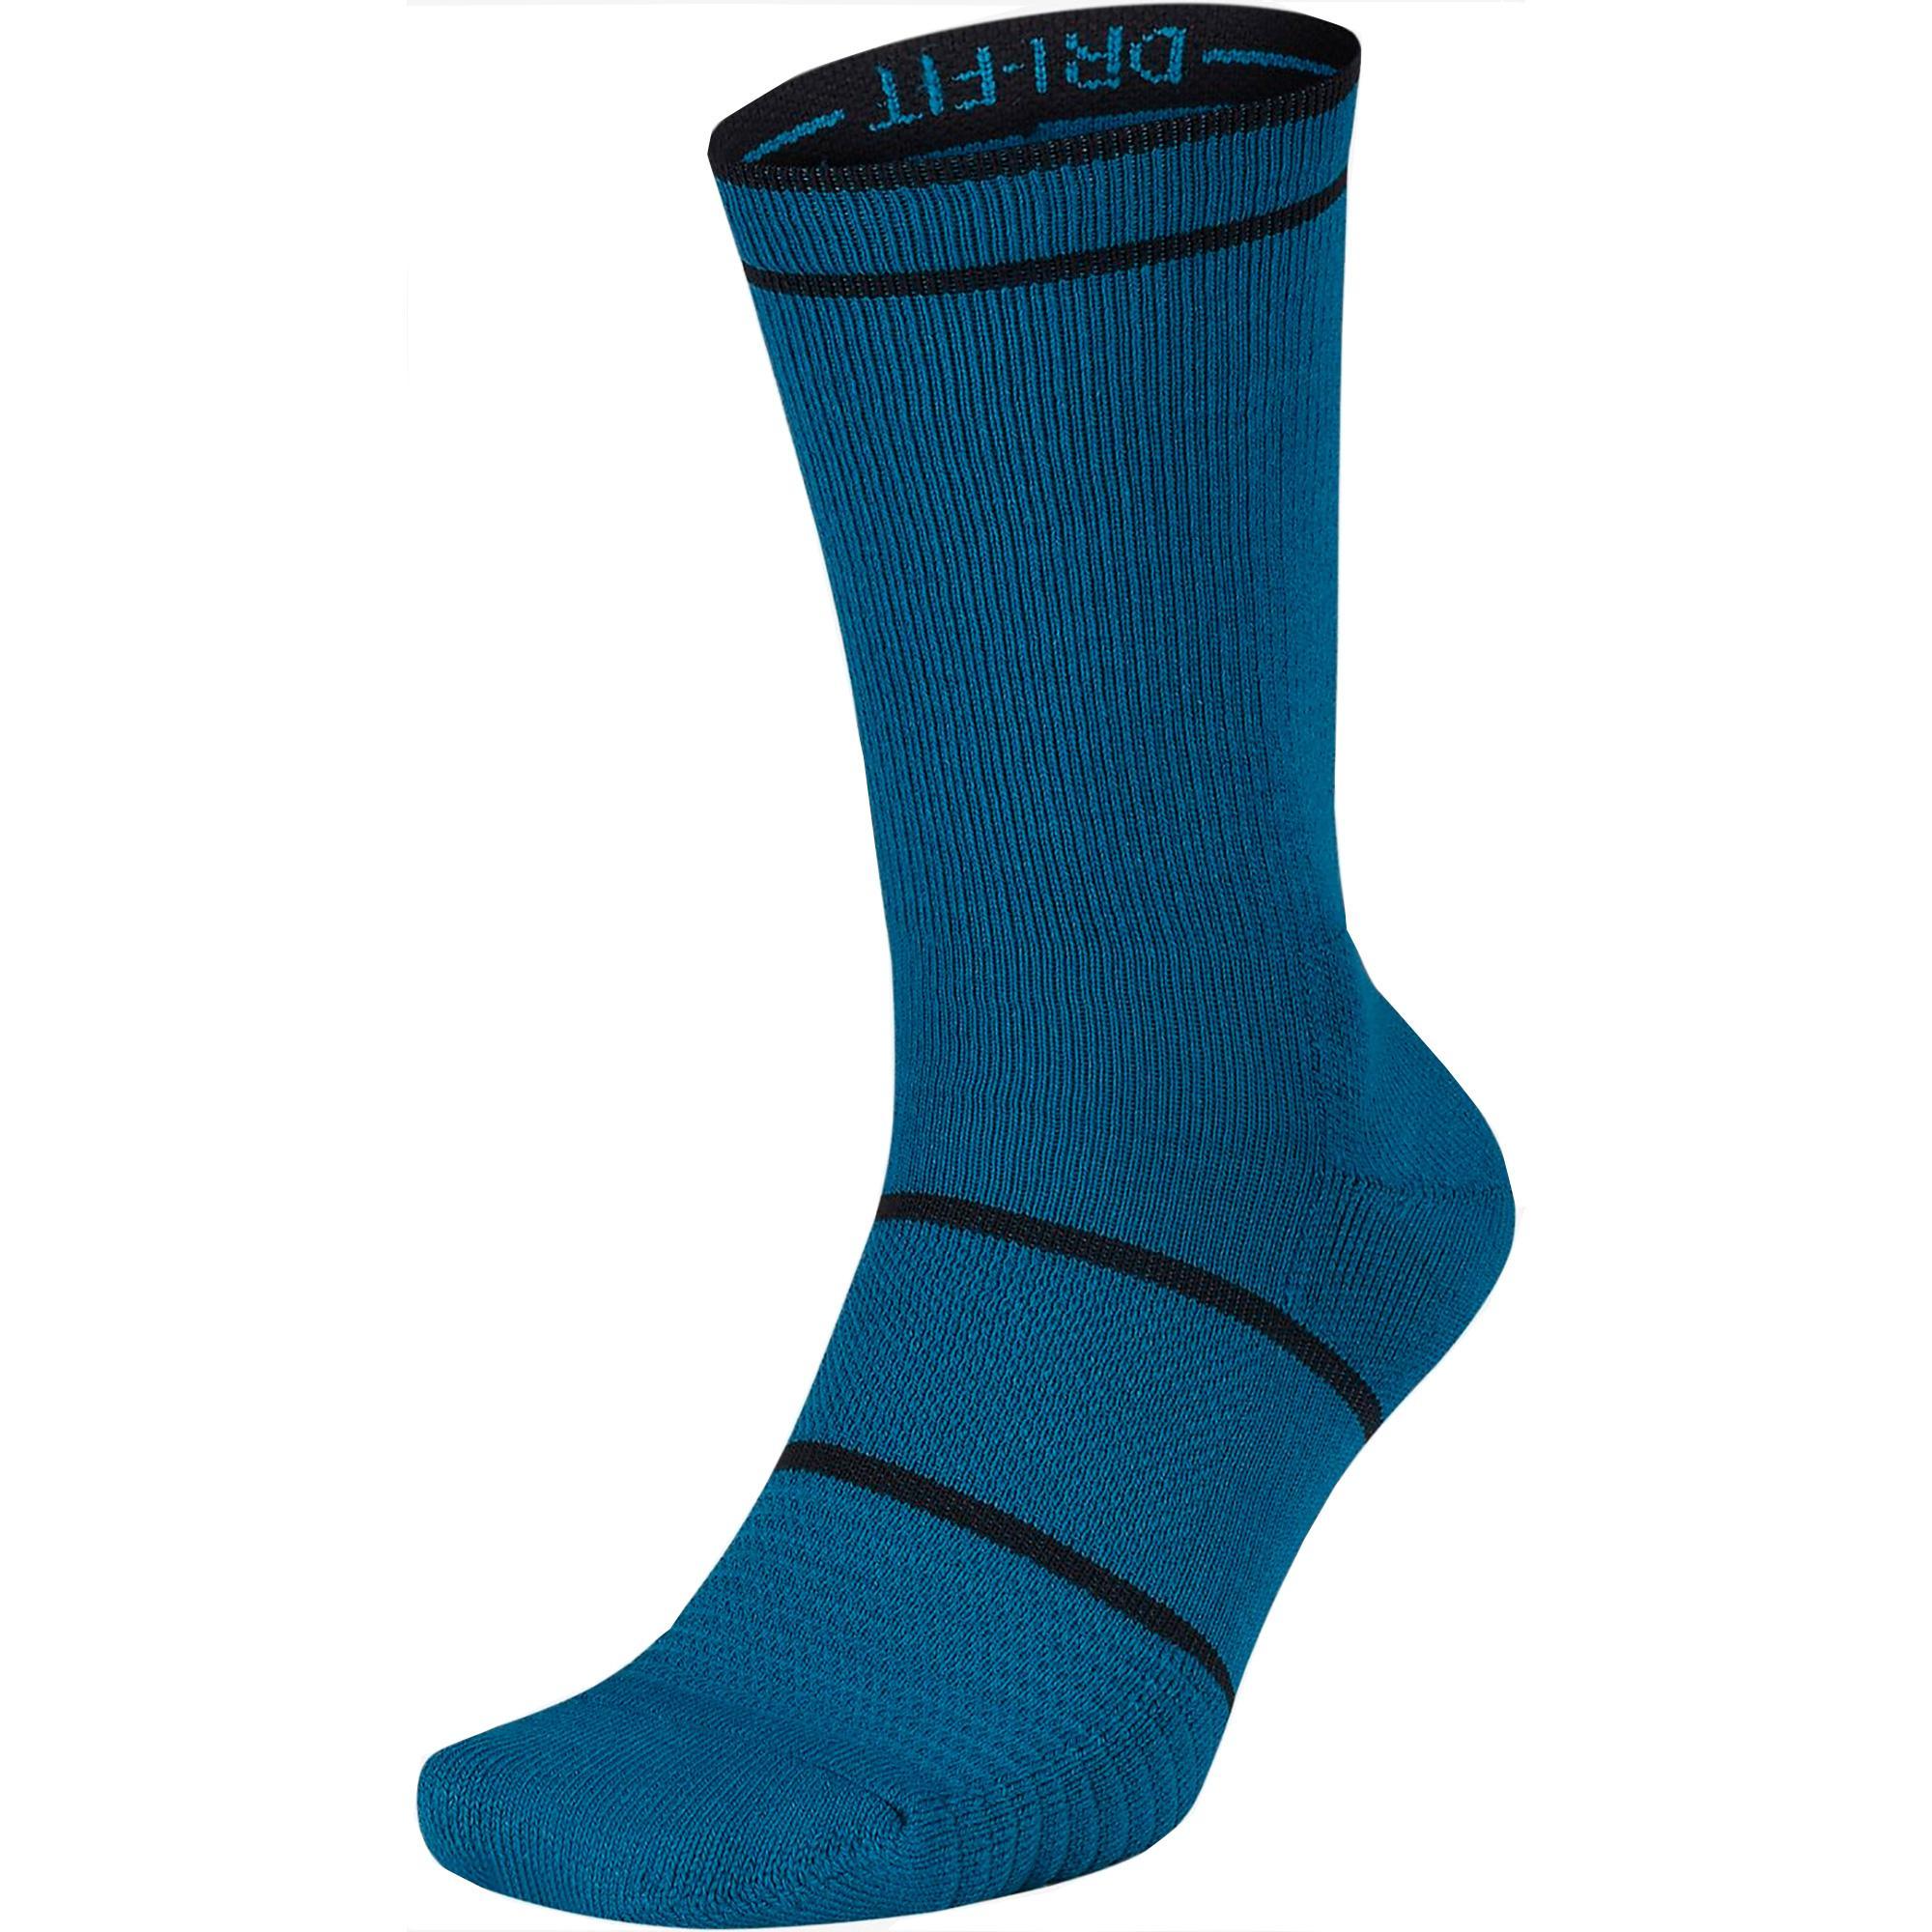 online store 7e59e c4847 ... Nike Court Essential Crew Socks (1 Pair) - Green AbyssBlack 2017all  black 2e2f3 c8110 ...